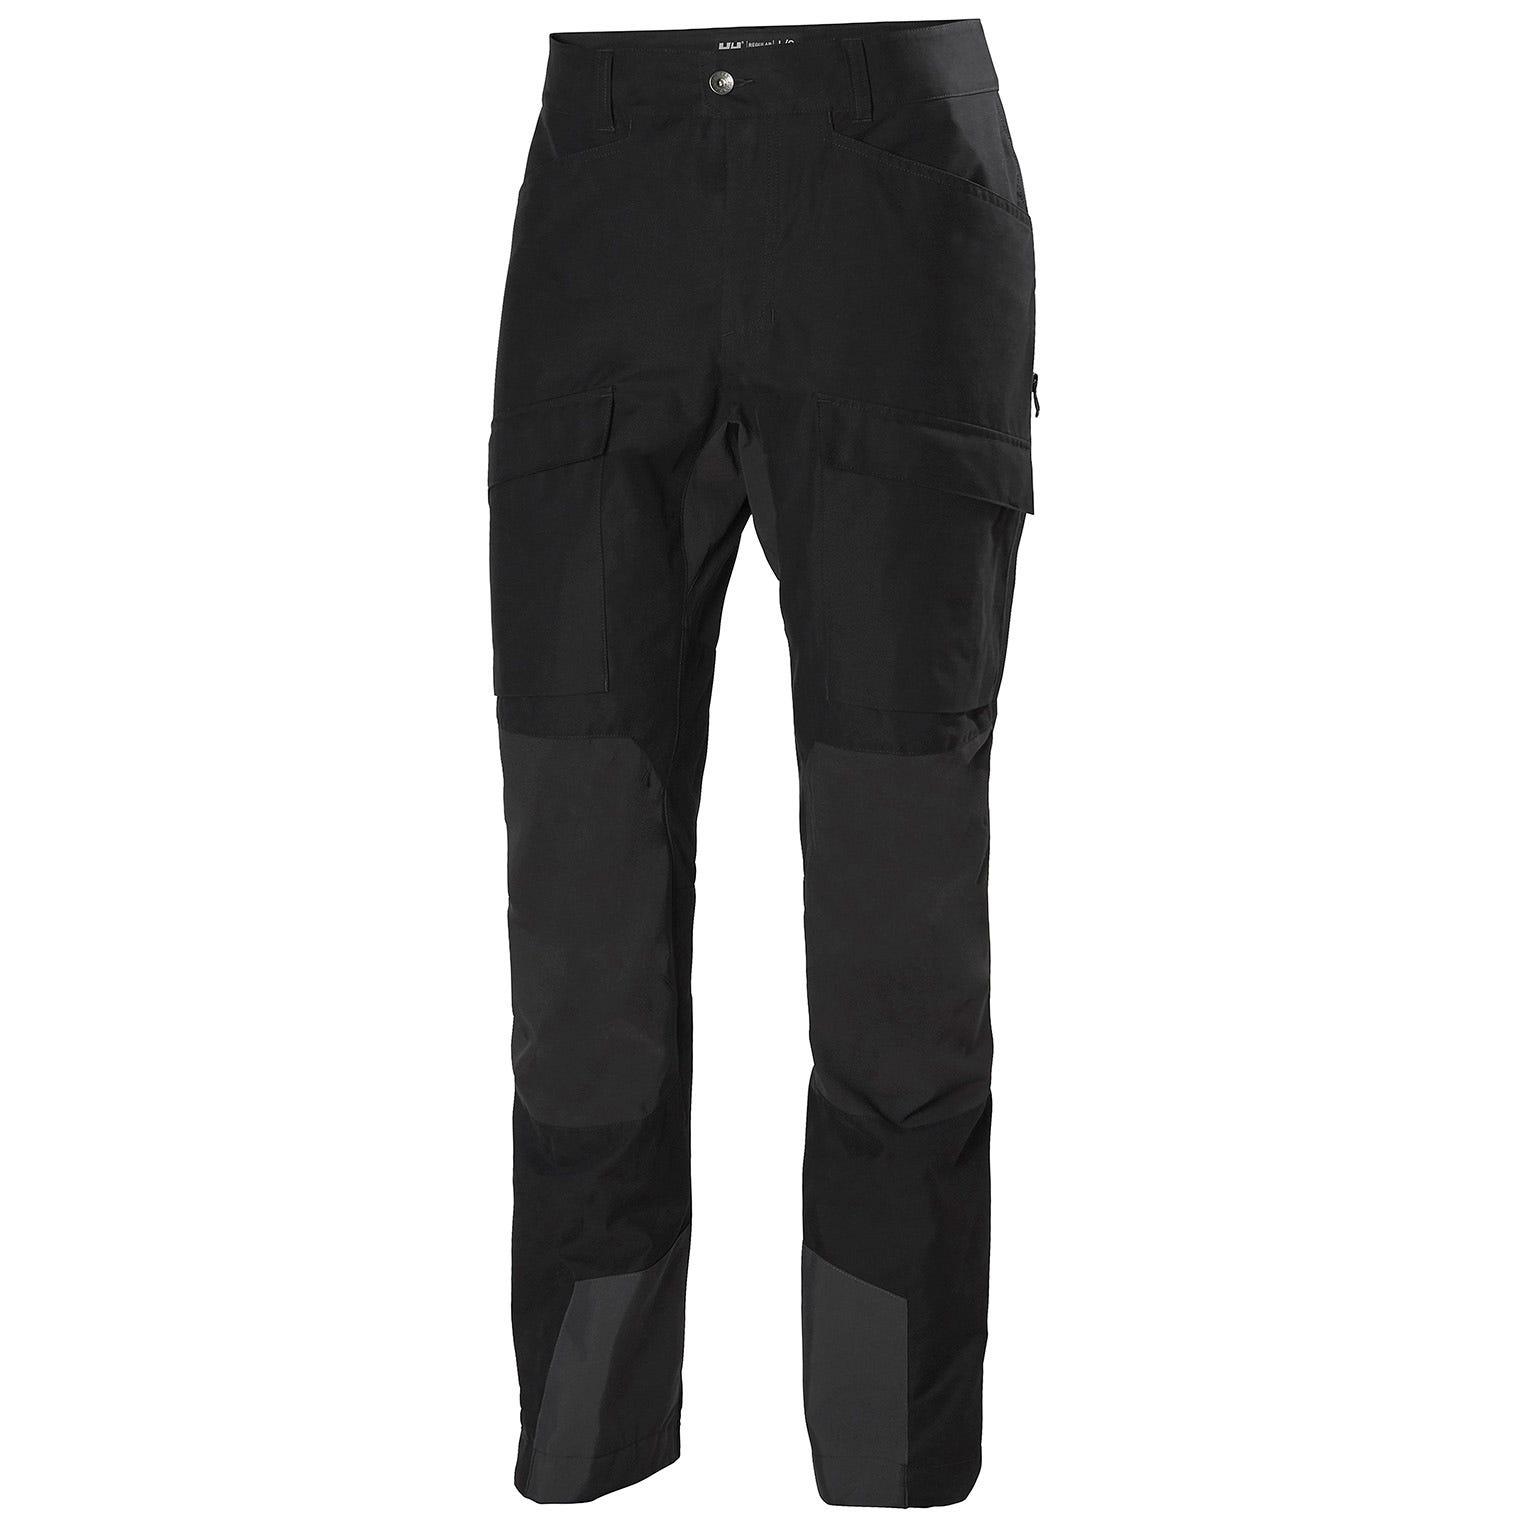 Helly Hansen Mens Veir Tur Stretch Trail Trousers L